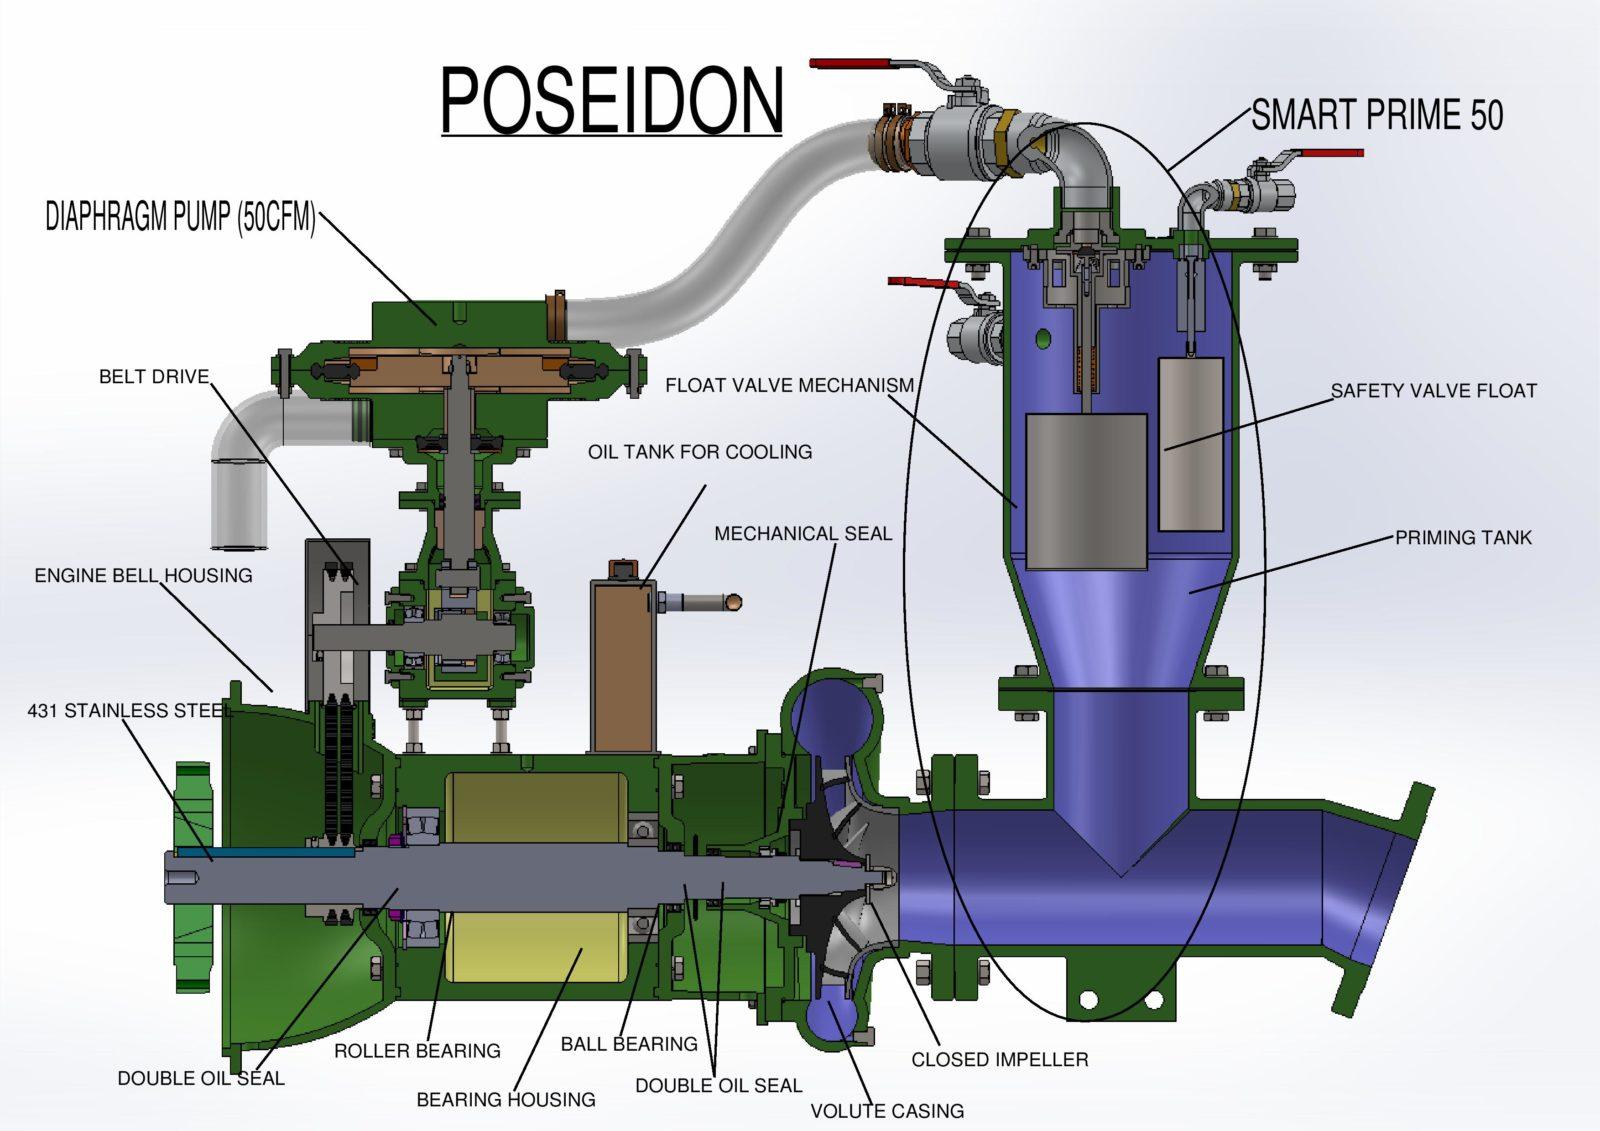 poseidon_pump_smartprime